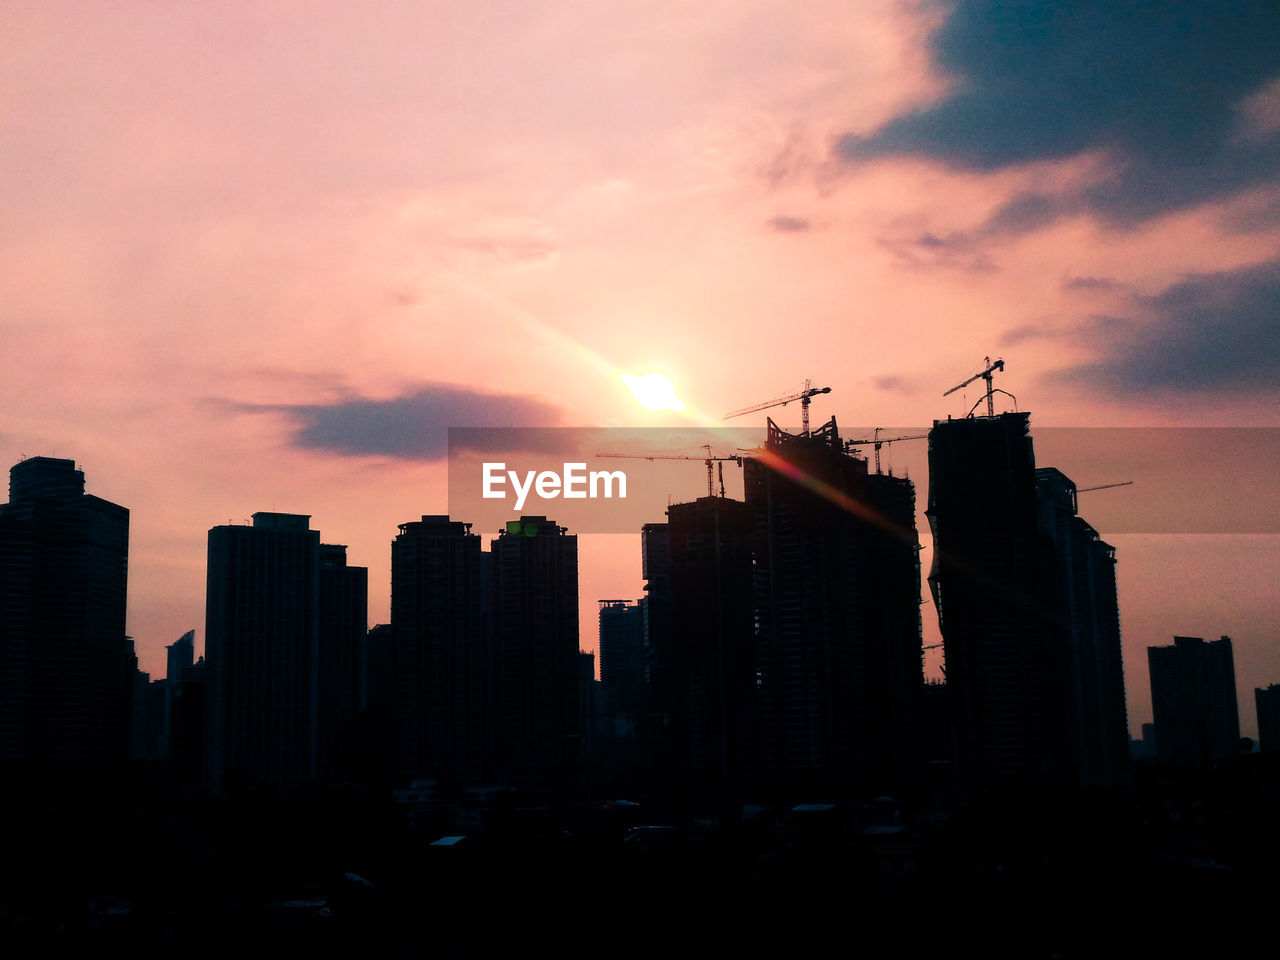 architecture, sunset, building exterior, built structure, skyscraper, city, modern, development, sky, cityscape, silhouette, no people, urban skyline, outdoors, travel destinations, day